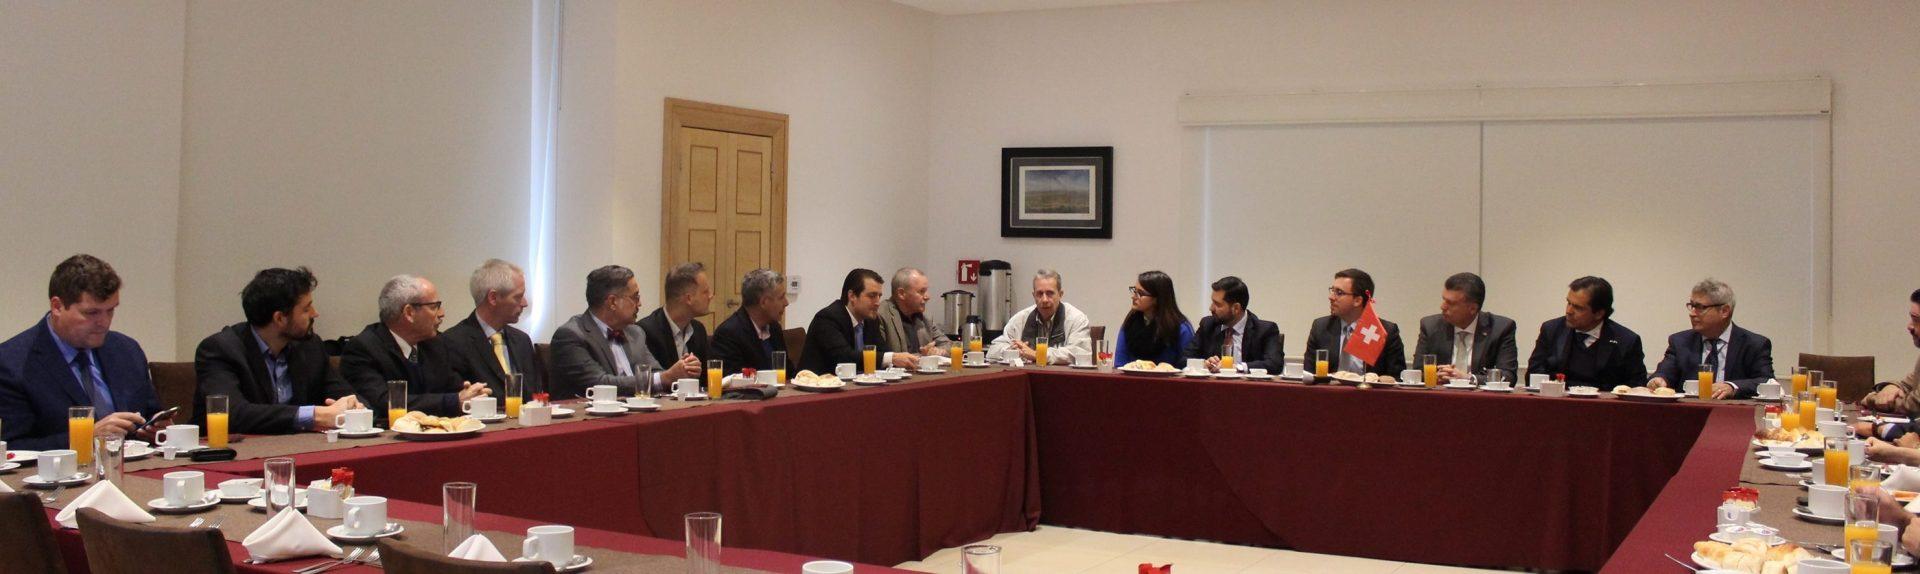 Business Breakfast in Querétaro